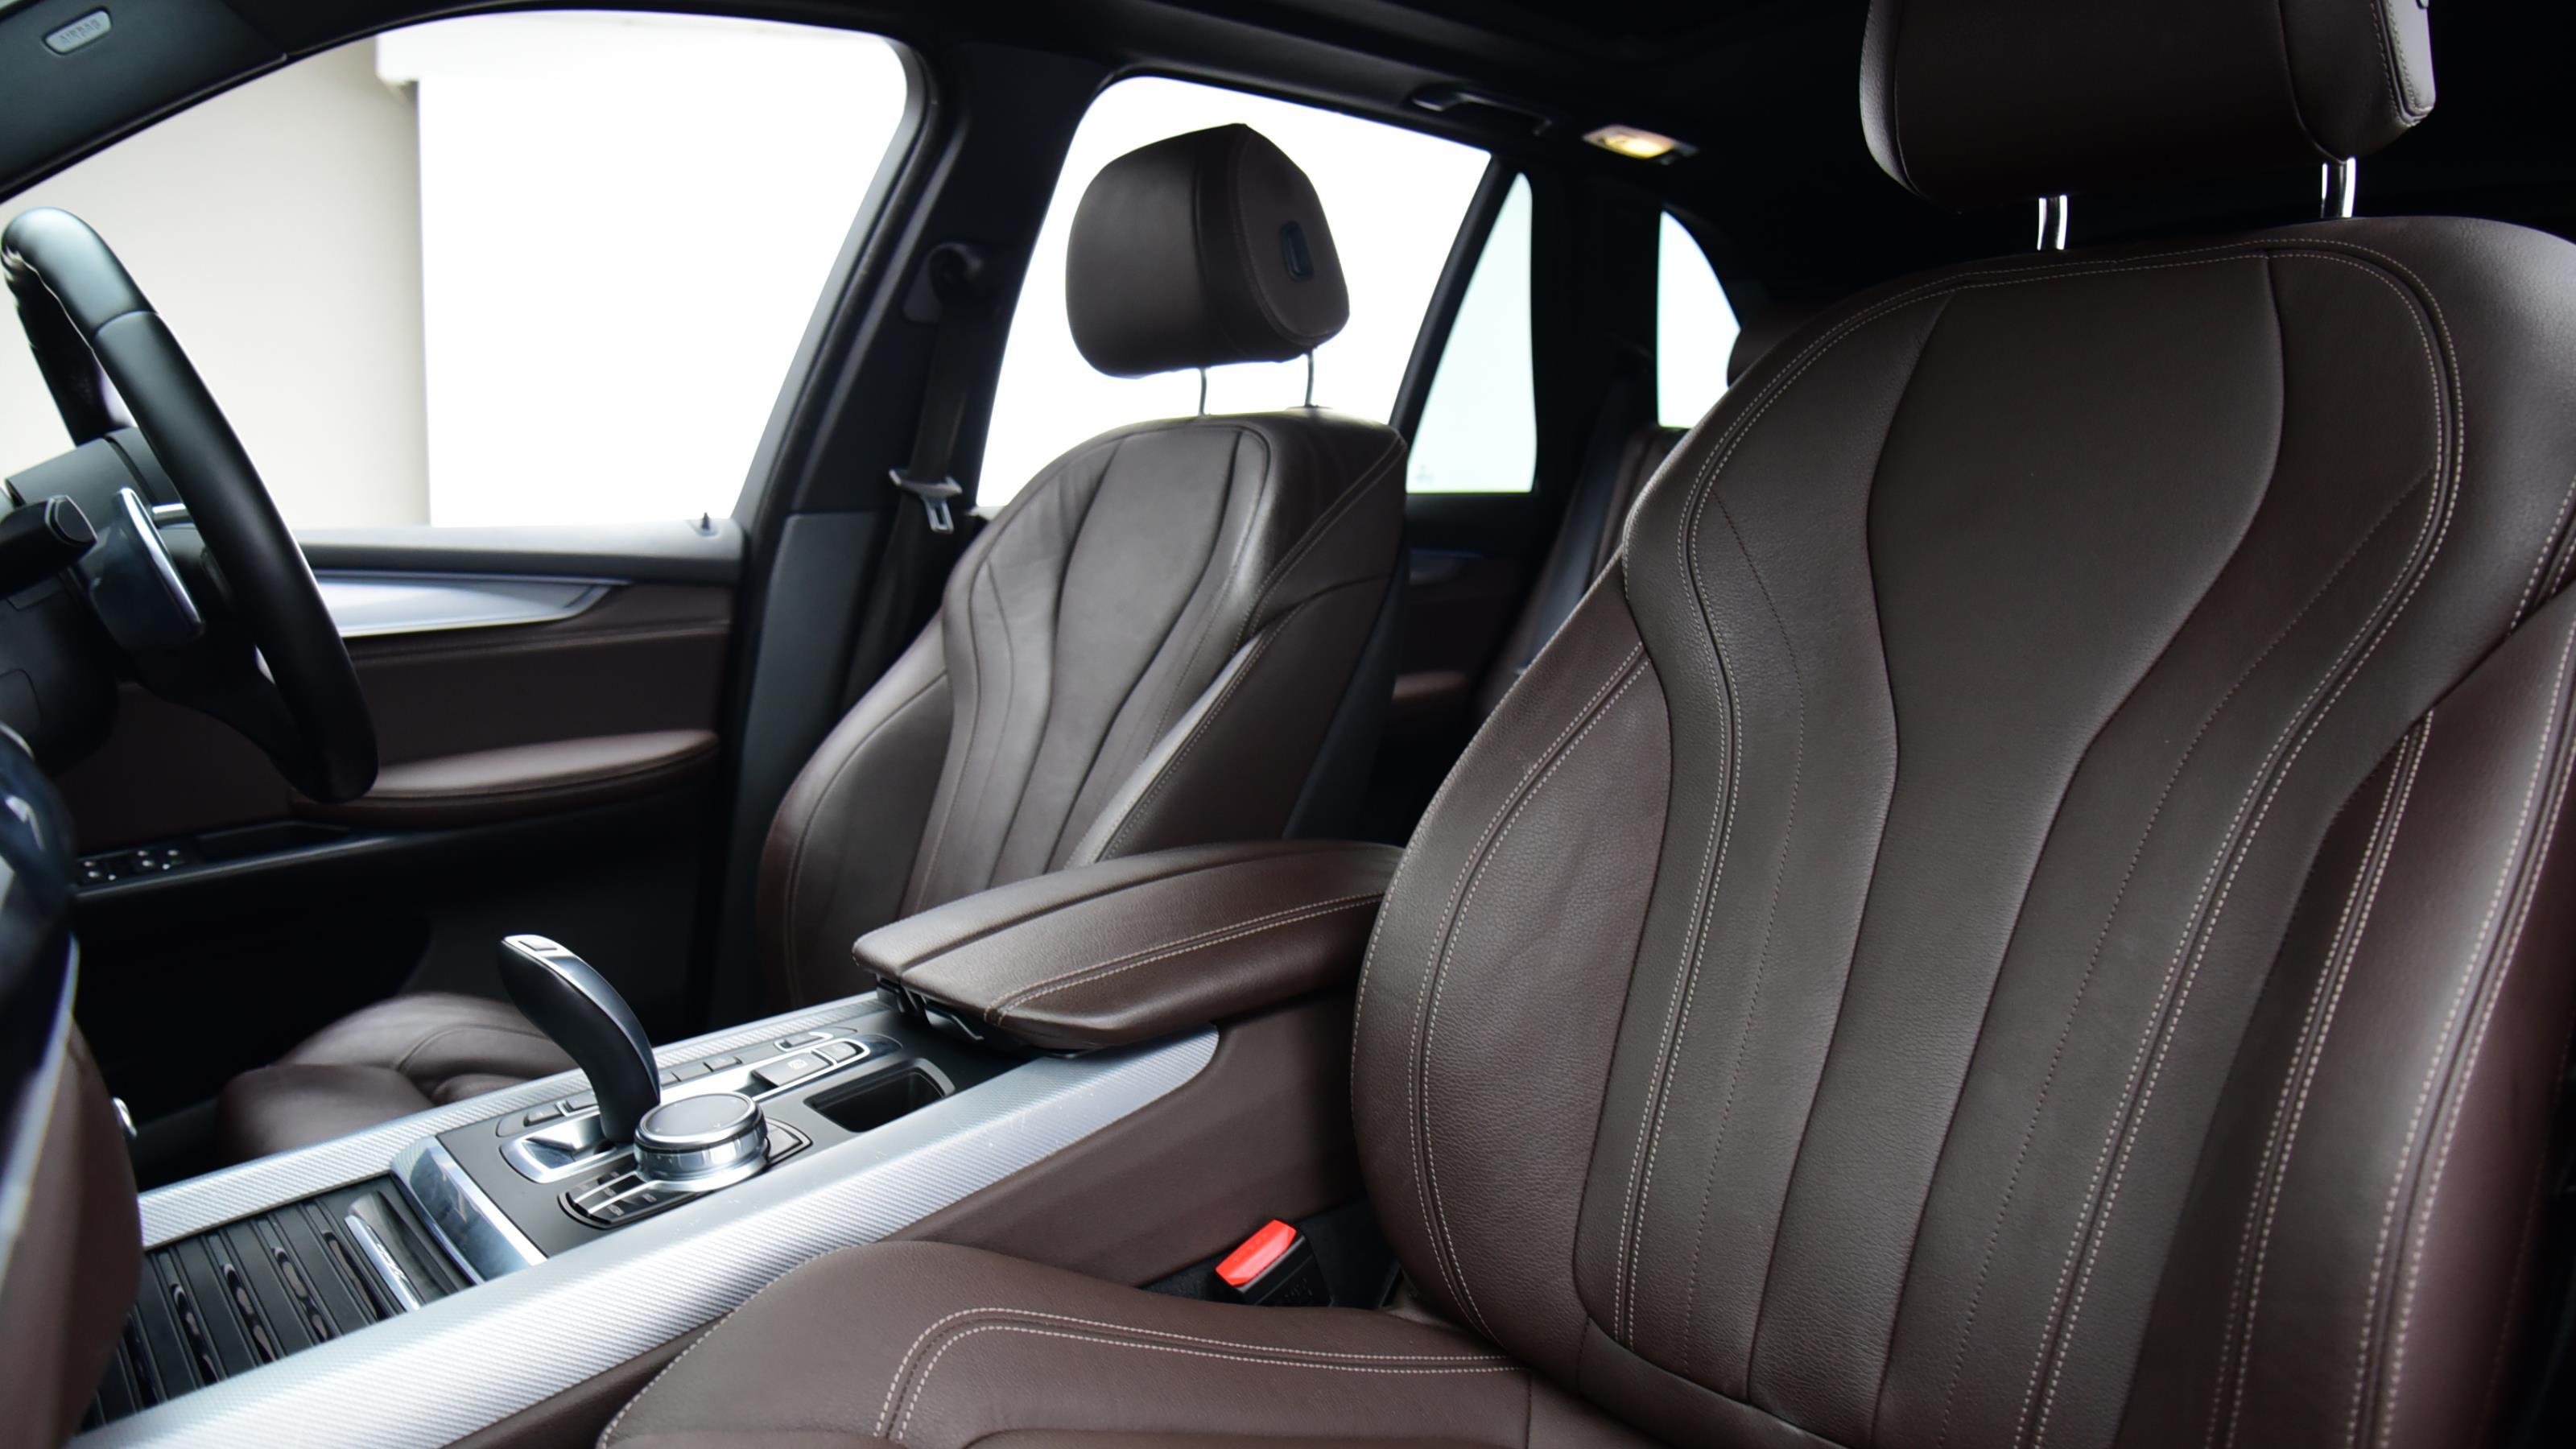 Used 2016 BMW X5 xDrive40e M Sport 5dr Auto BLACK at Saxton4x4